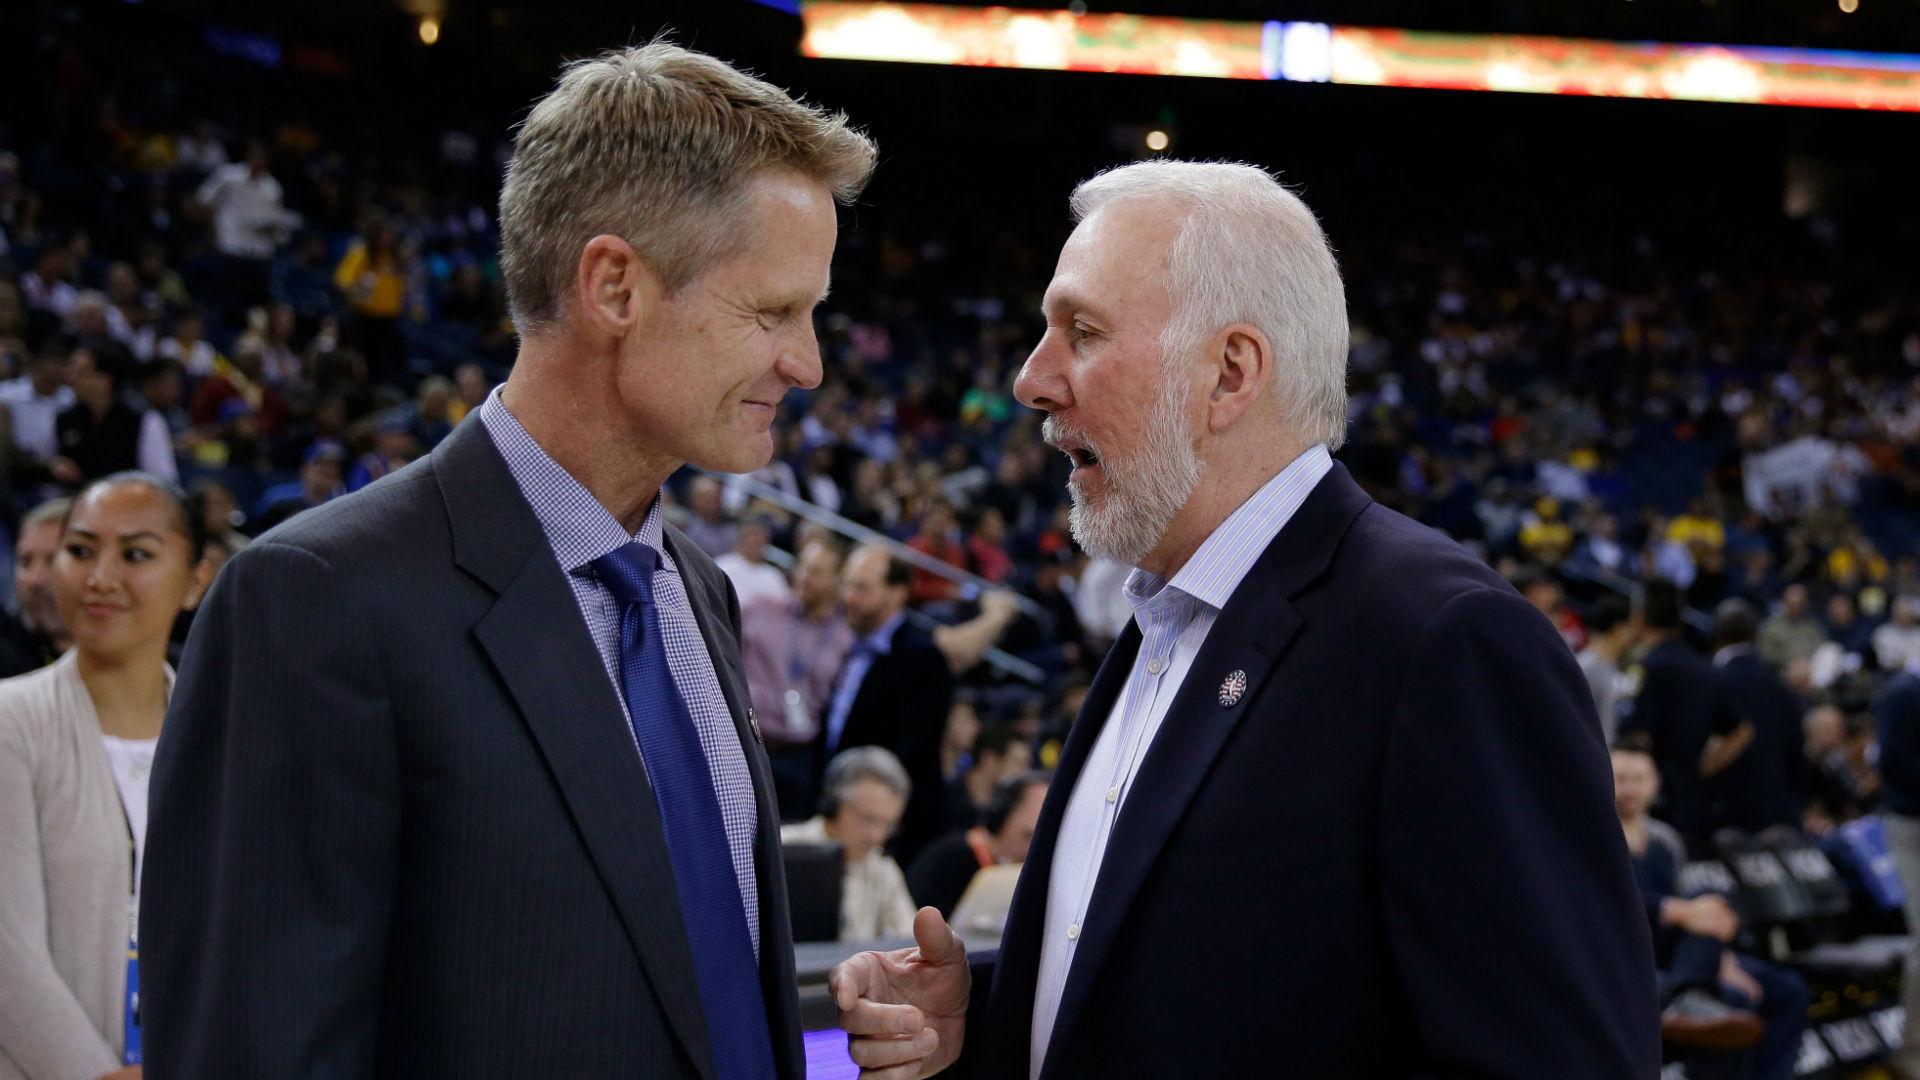 Gregg Popovich, Steve Kerr react to Knicks firing coach David Fizdale